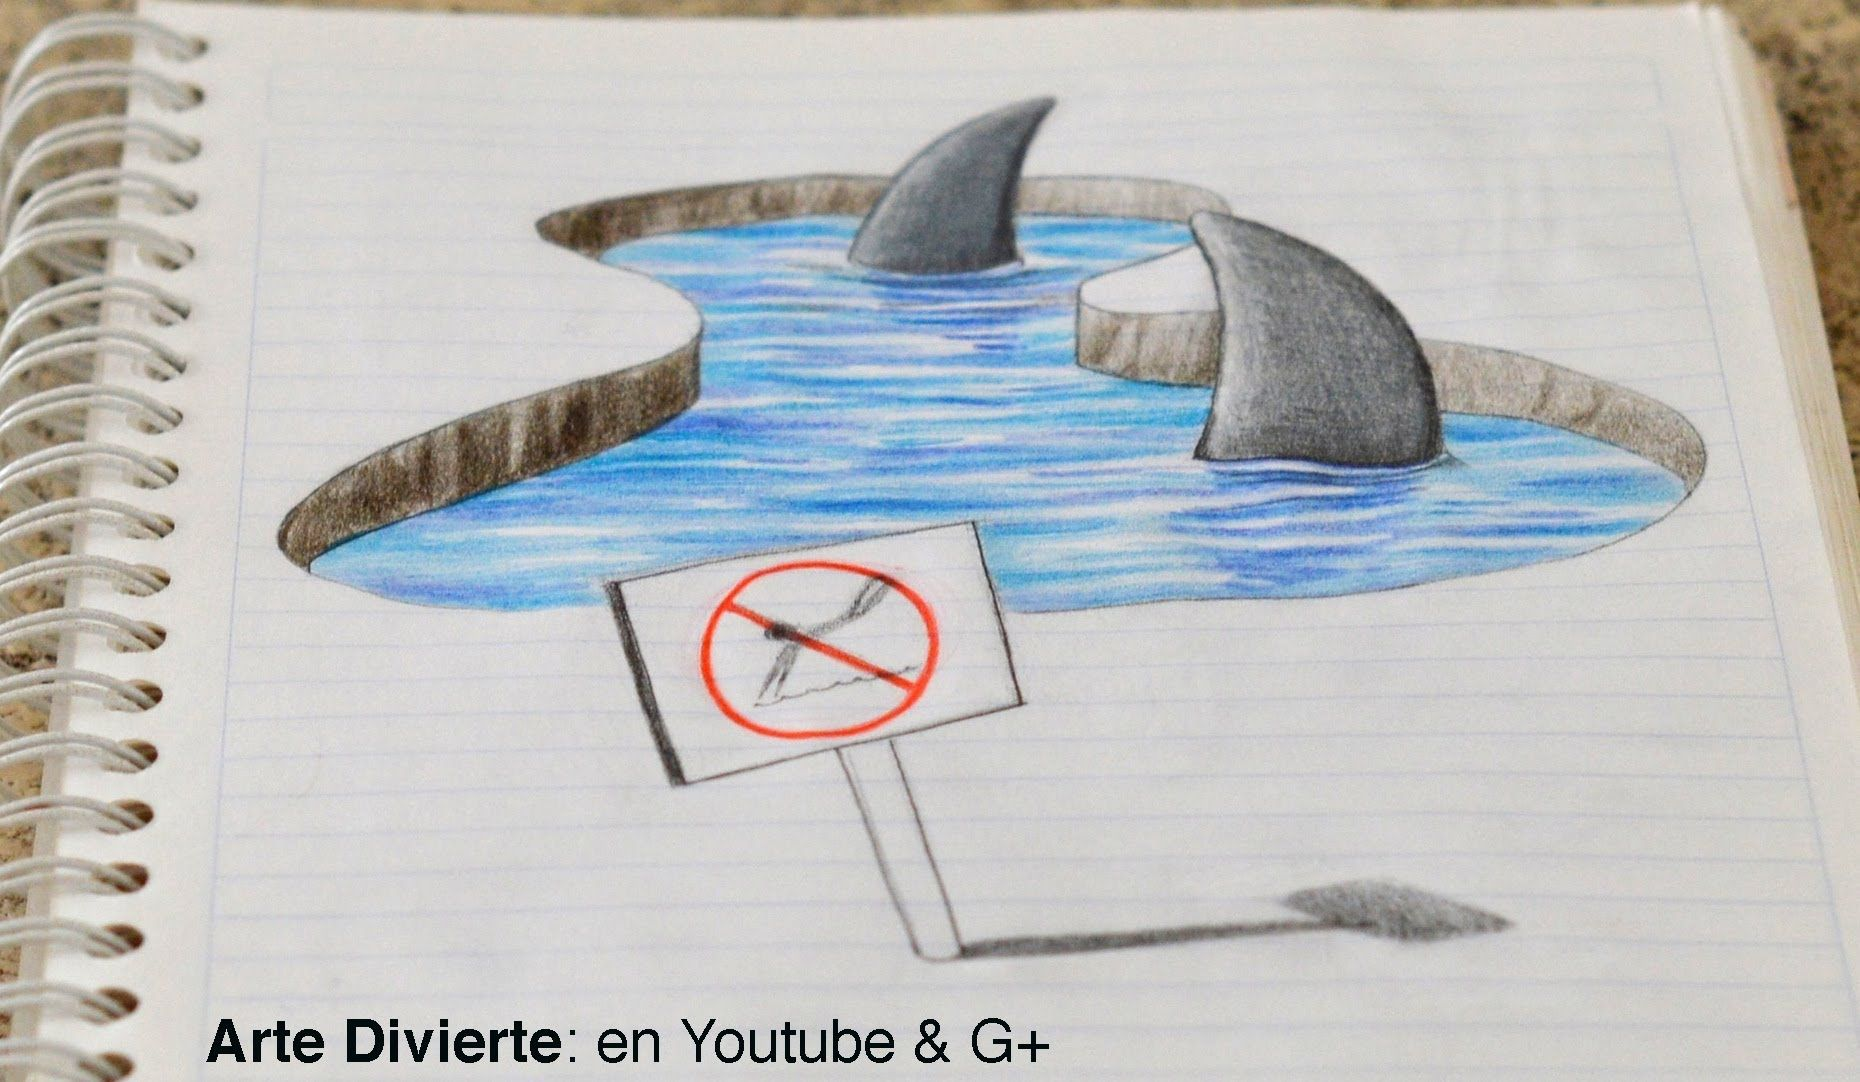 Dibujo Anamorfico Dibujando Tiburones 3d En Mi Cuaderno Arte Divierte Arte Divertido Dibujos Dibujos 3d A Lapiz